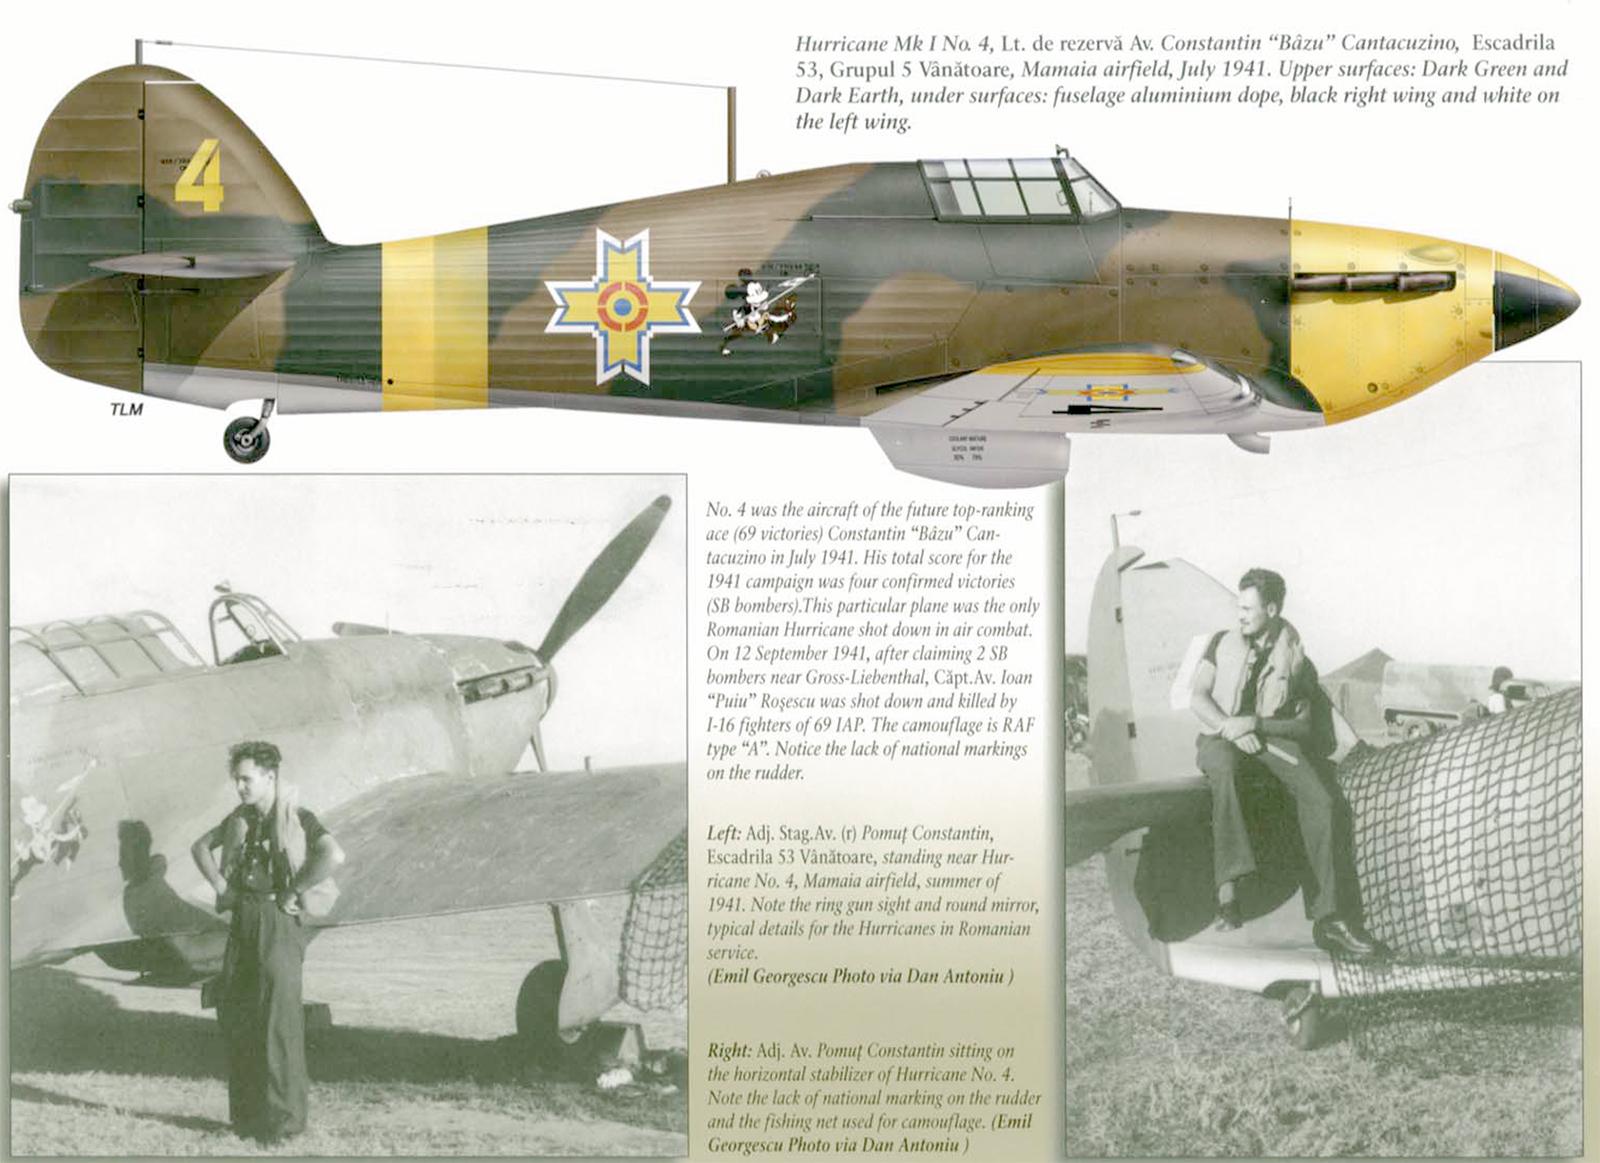 Hawker Hurricane Rumanian AF Esc 53 Yellow 4 Horia Agarici Rumania 1941 Mushroom 9111 0A